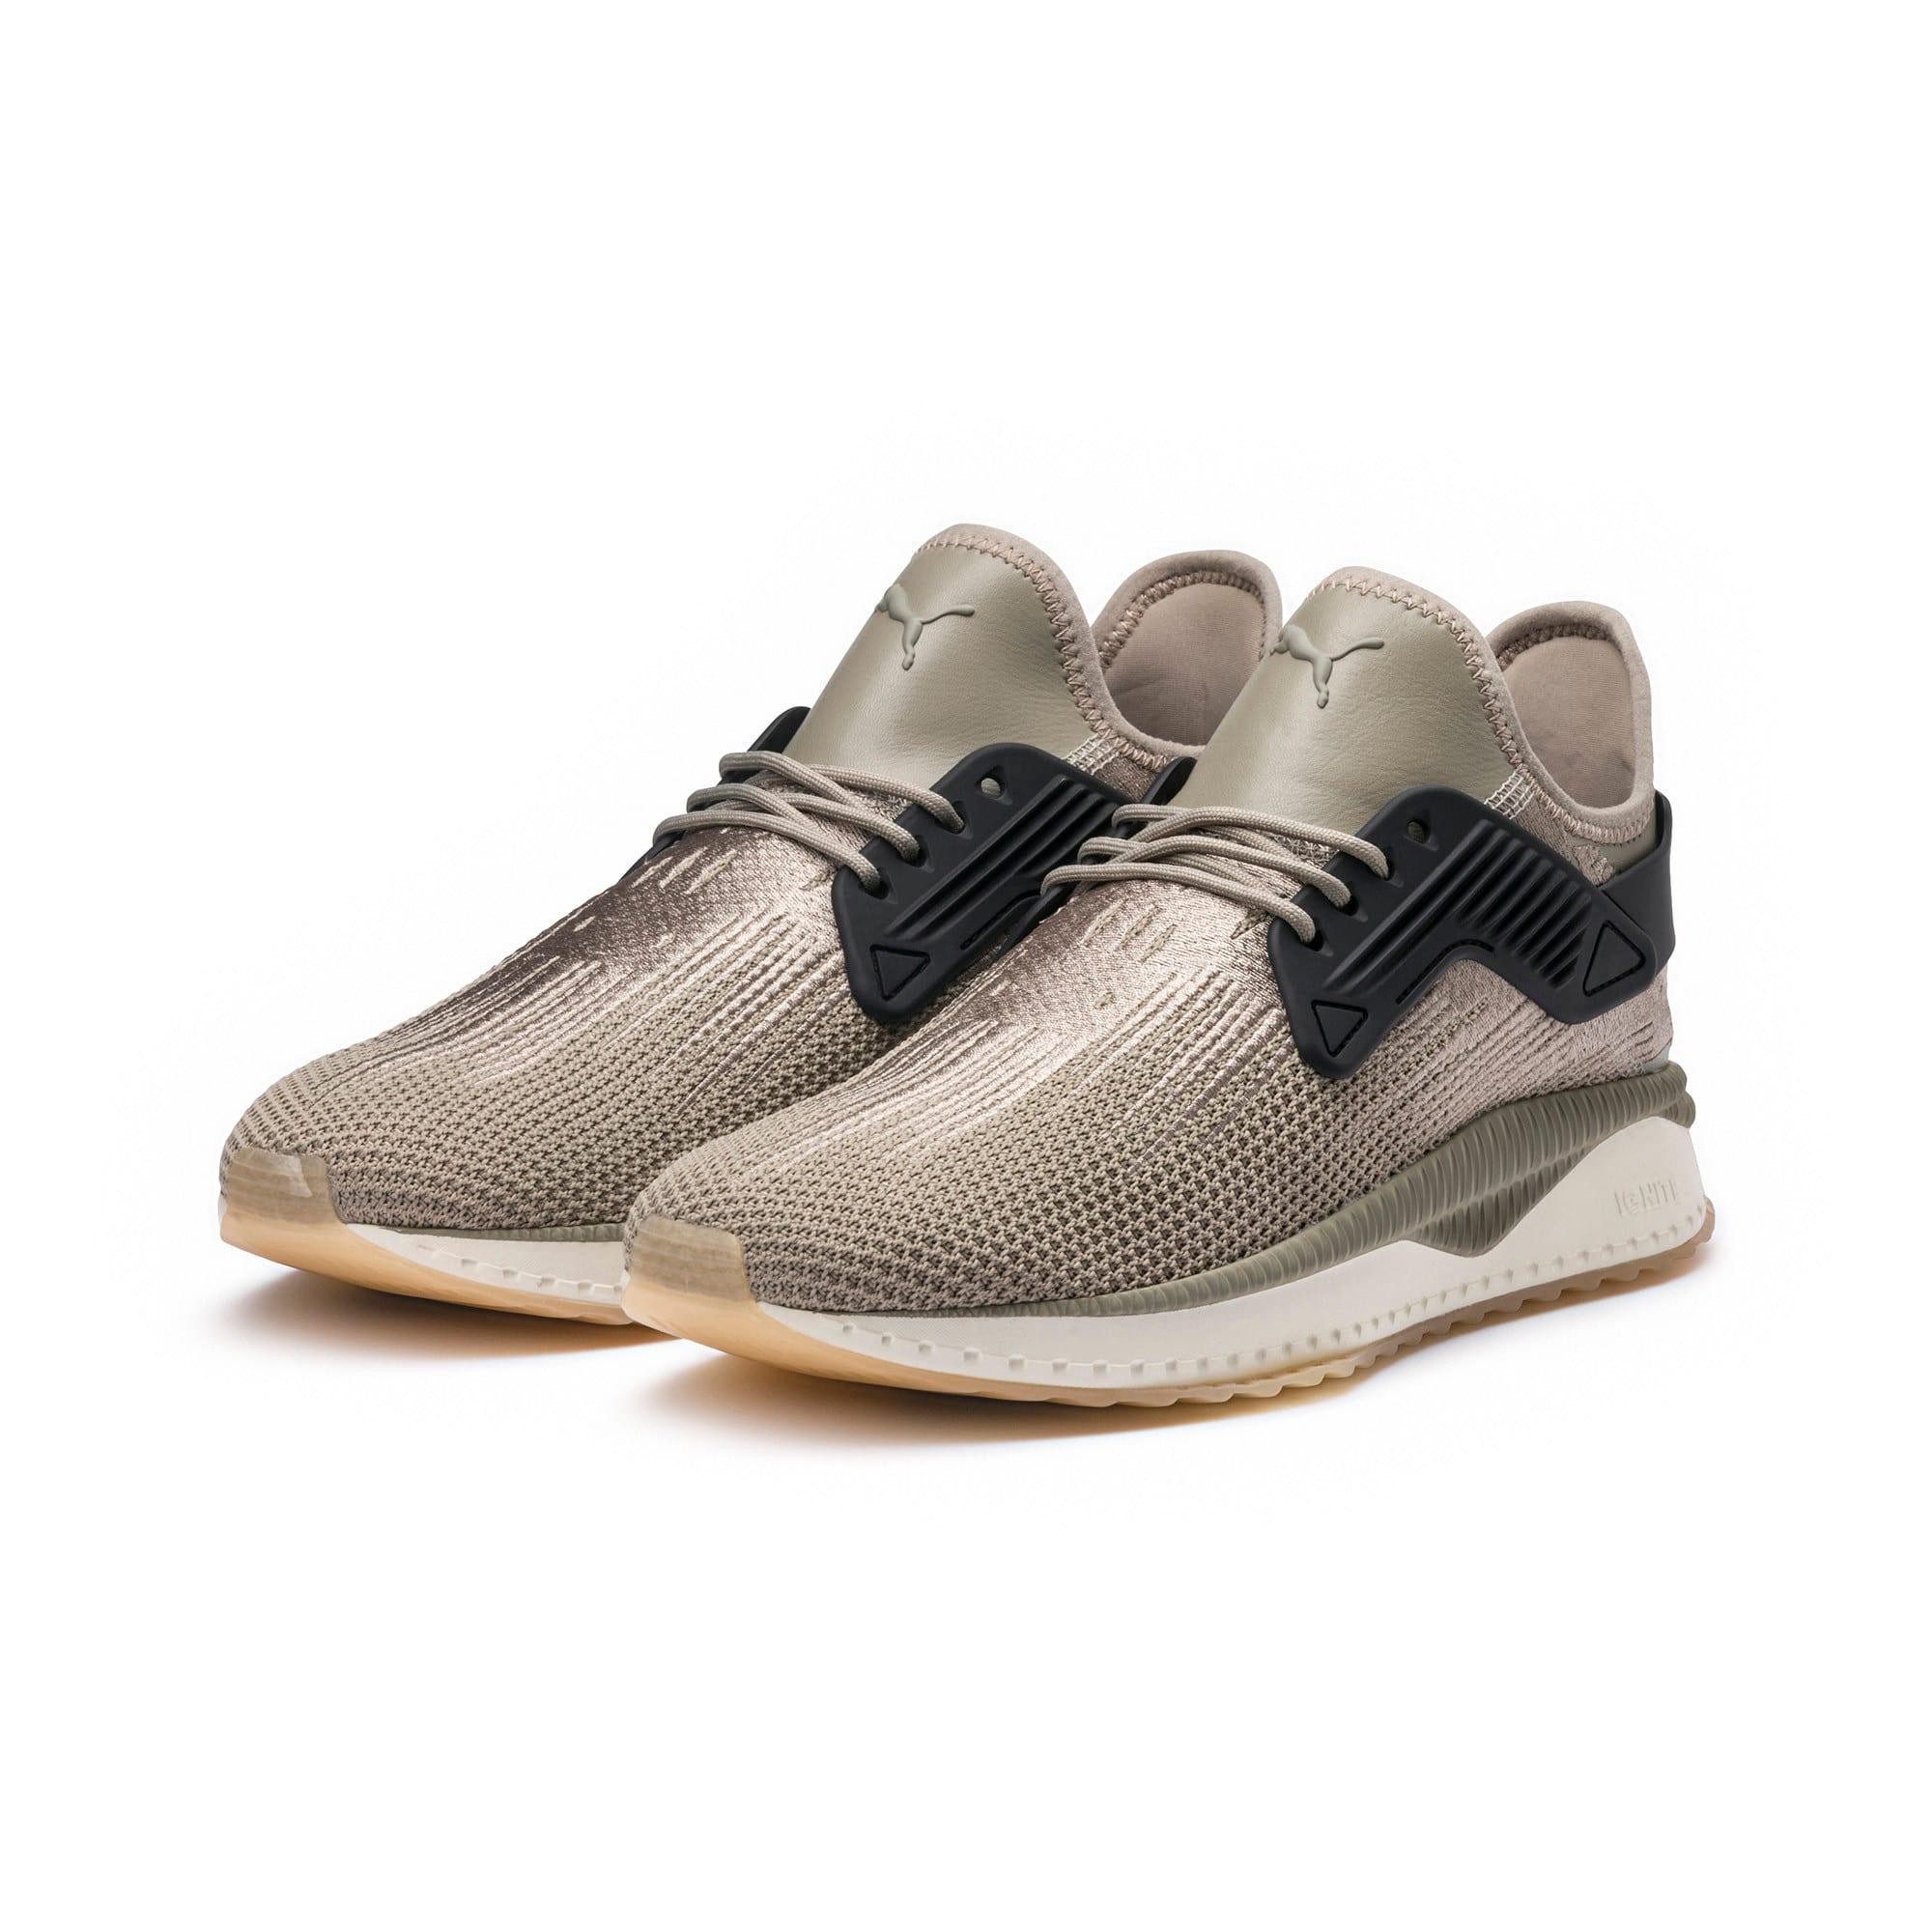 Thumbnail 2 of TSUGI Cage Premium Sneakers, Elephant Skin-Puma Black, medium